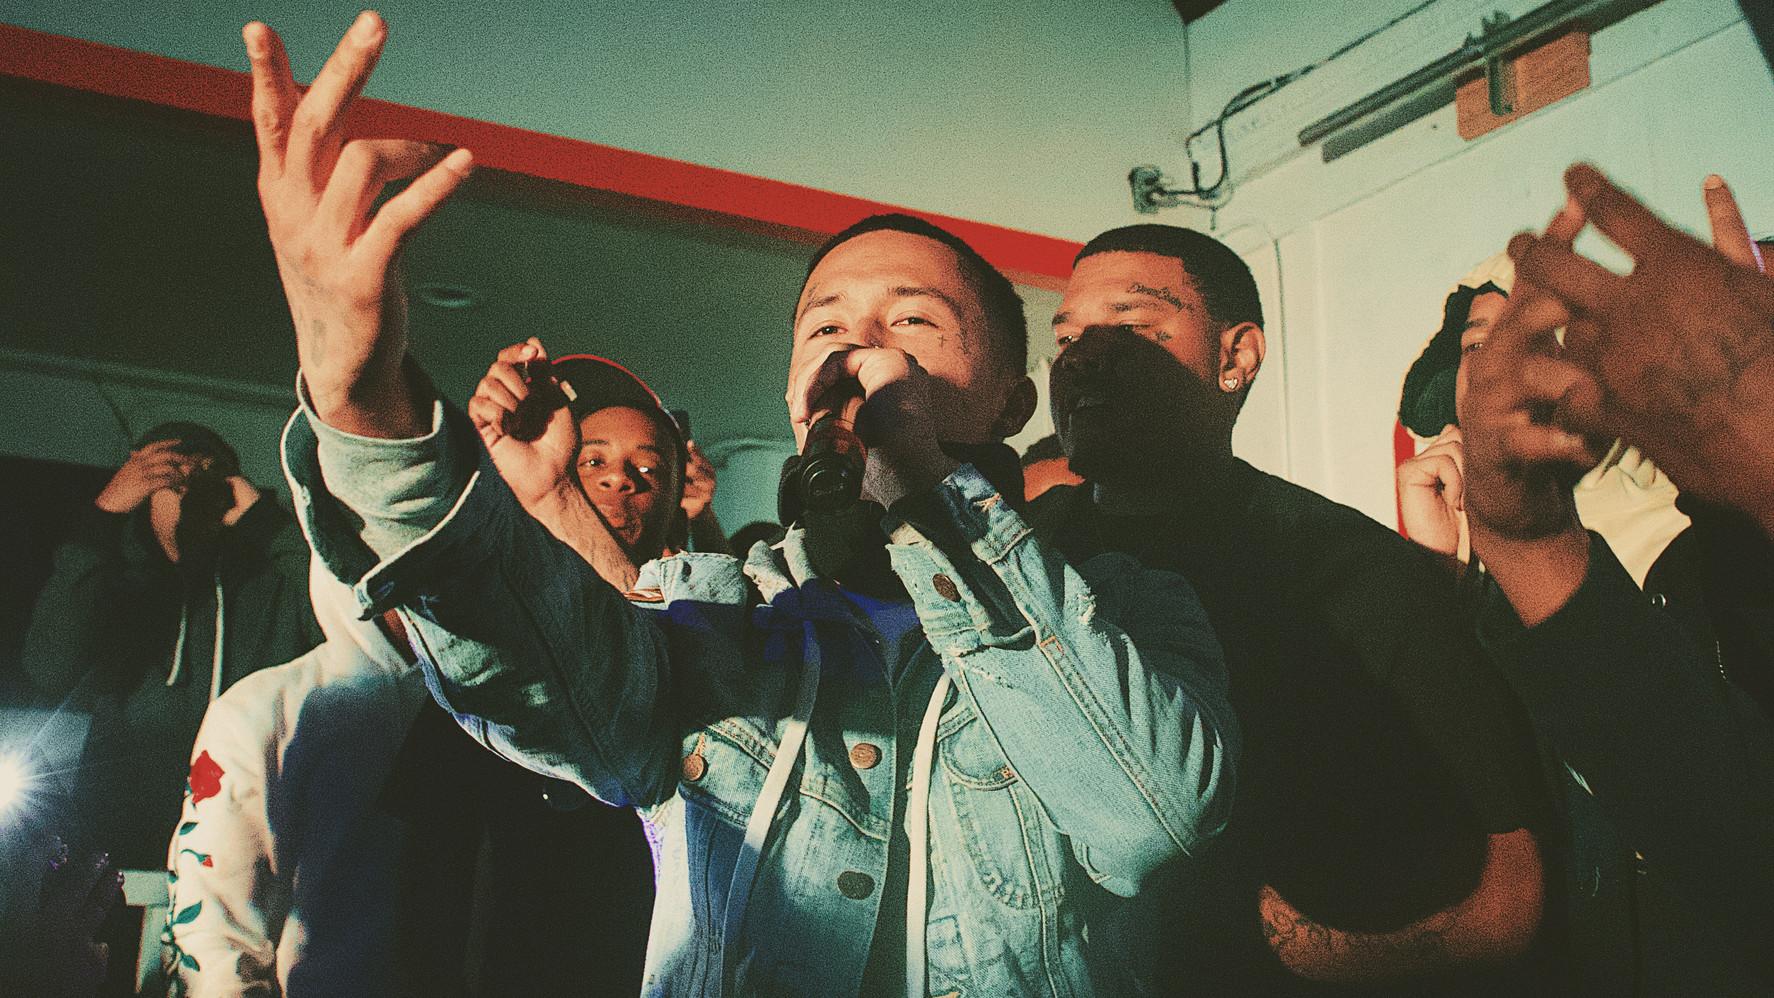 3.1.20 | MBNel | Complex, Oakland, CA | Photographer: Jonathan Galindo - Nu Ricks